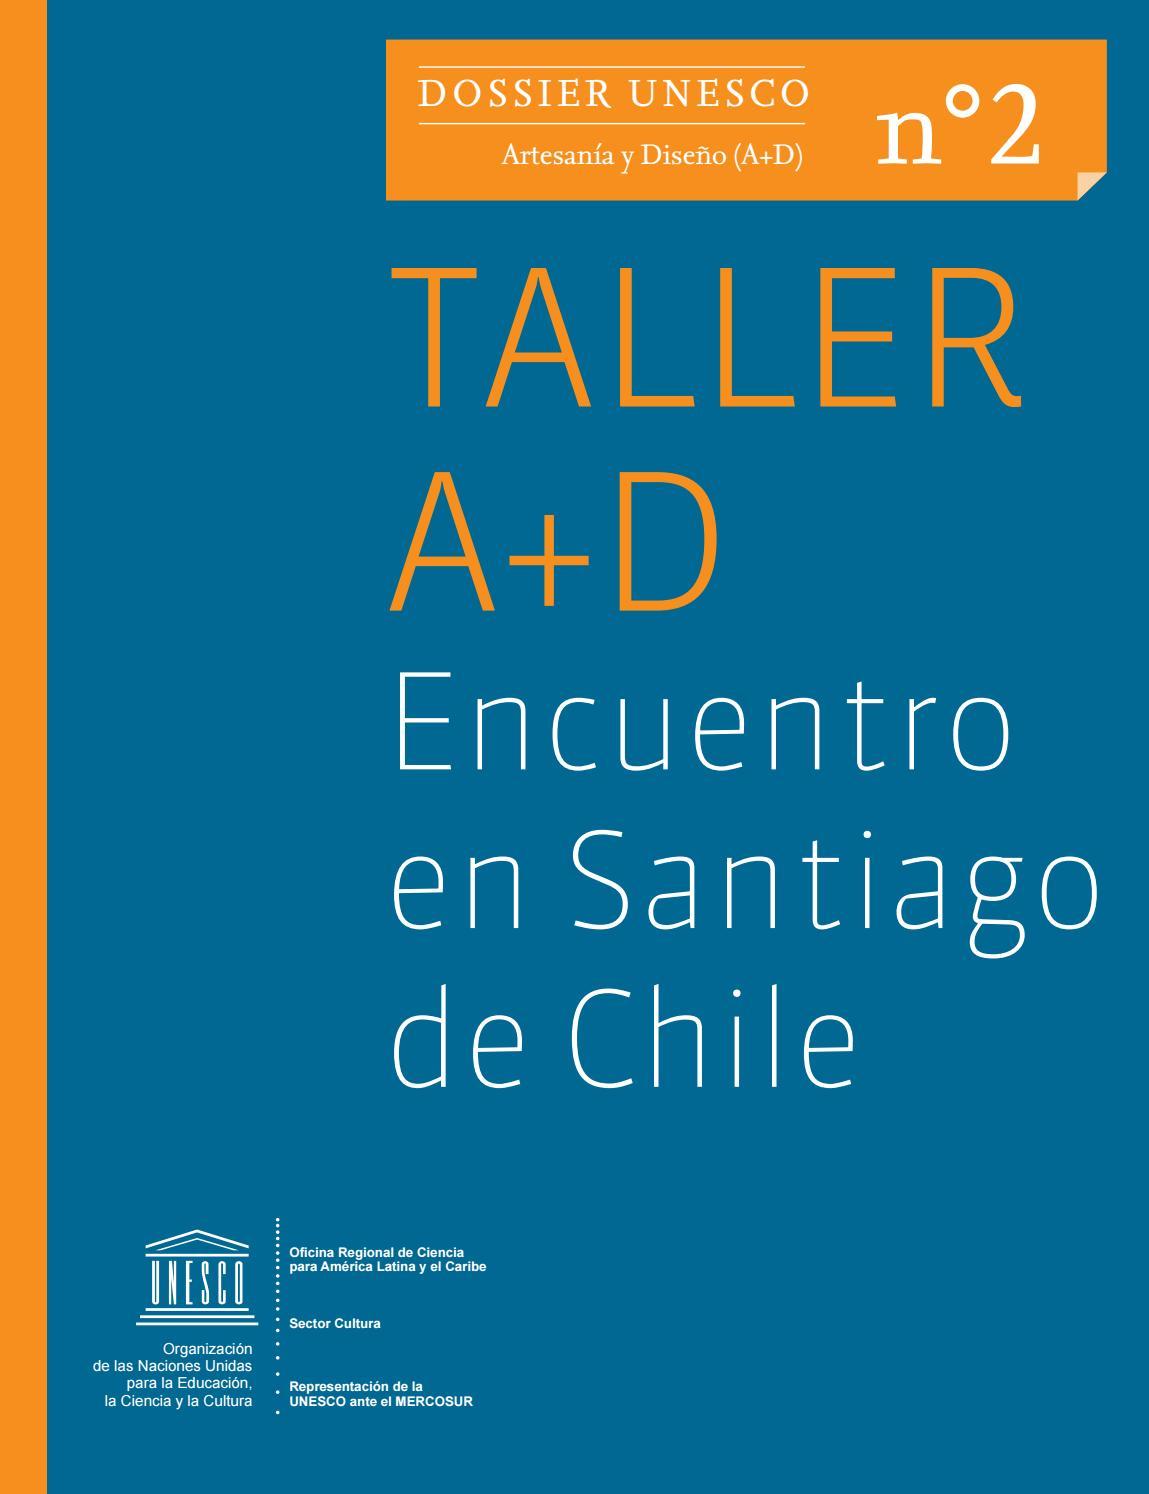 3a2e904303db Dossier n°2 Taller A+D Encuentro en Santiago de Chile by Artesanía ...